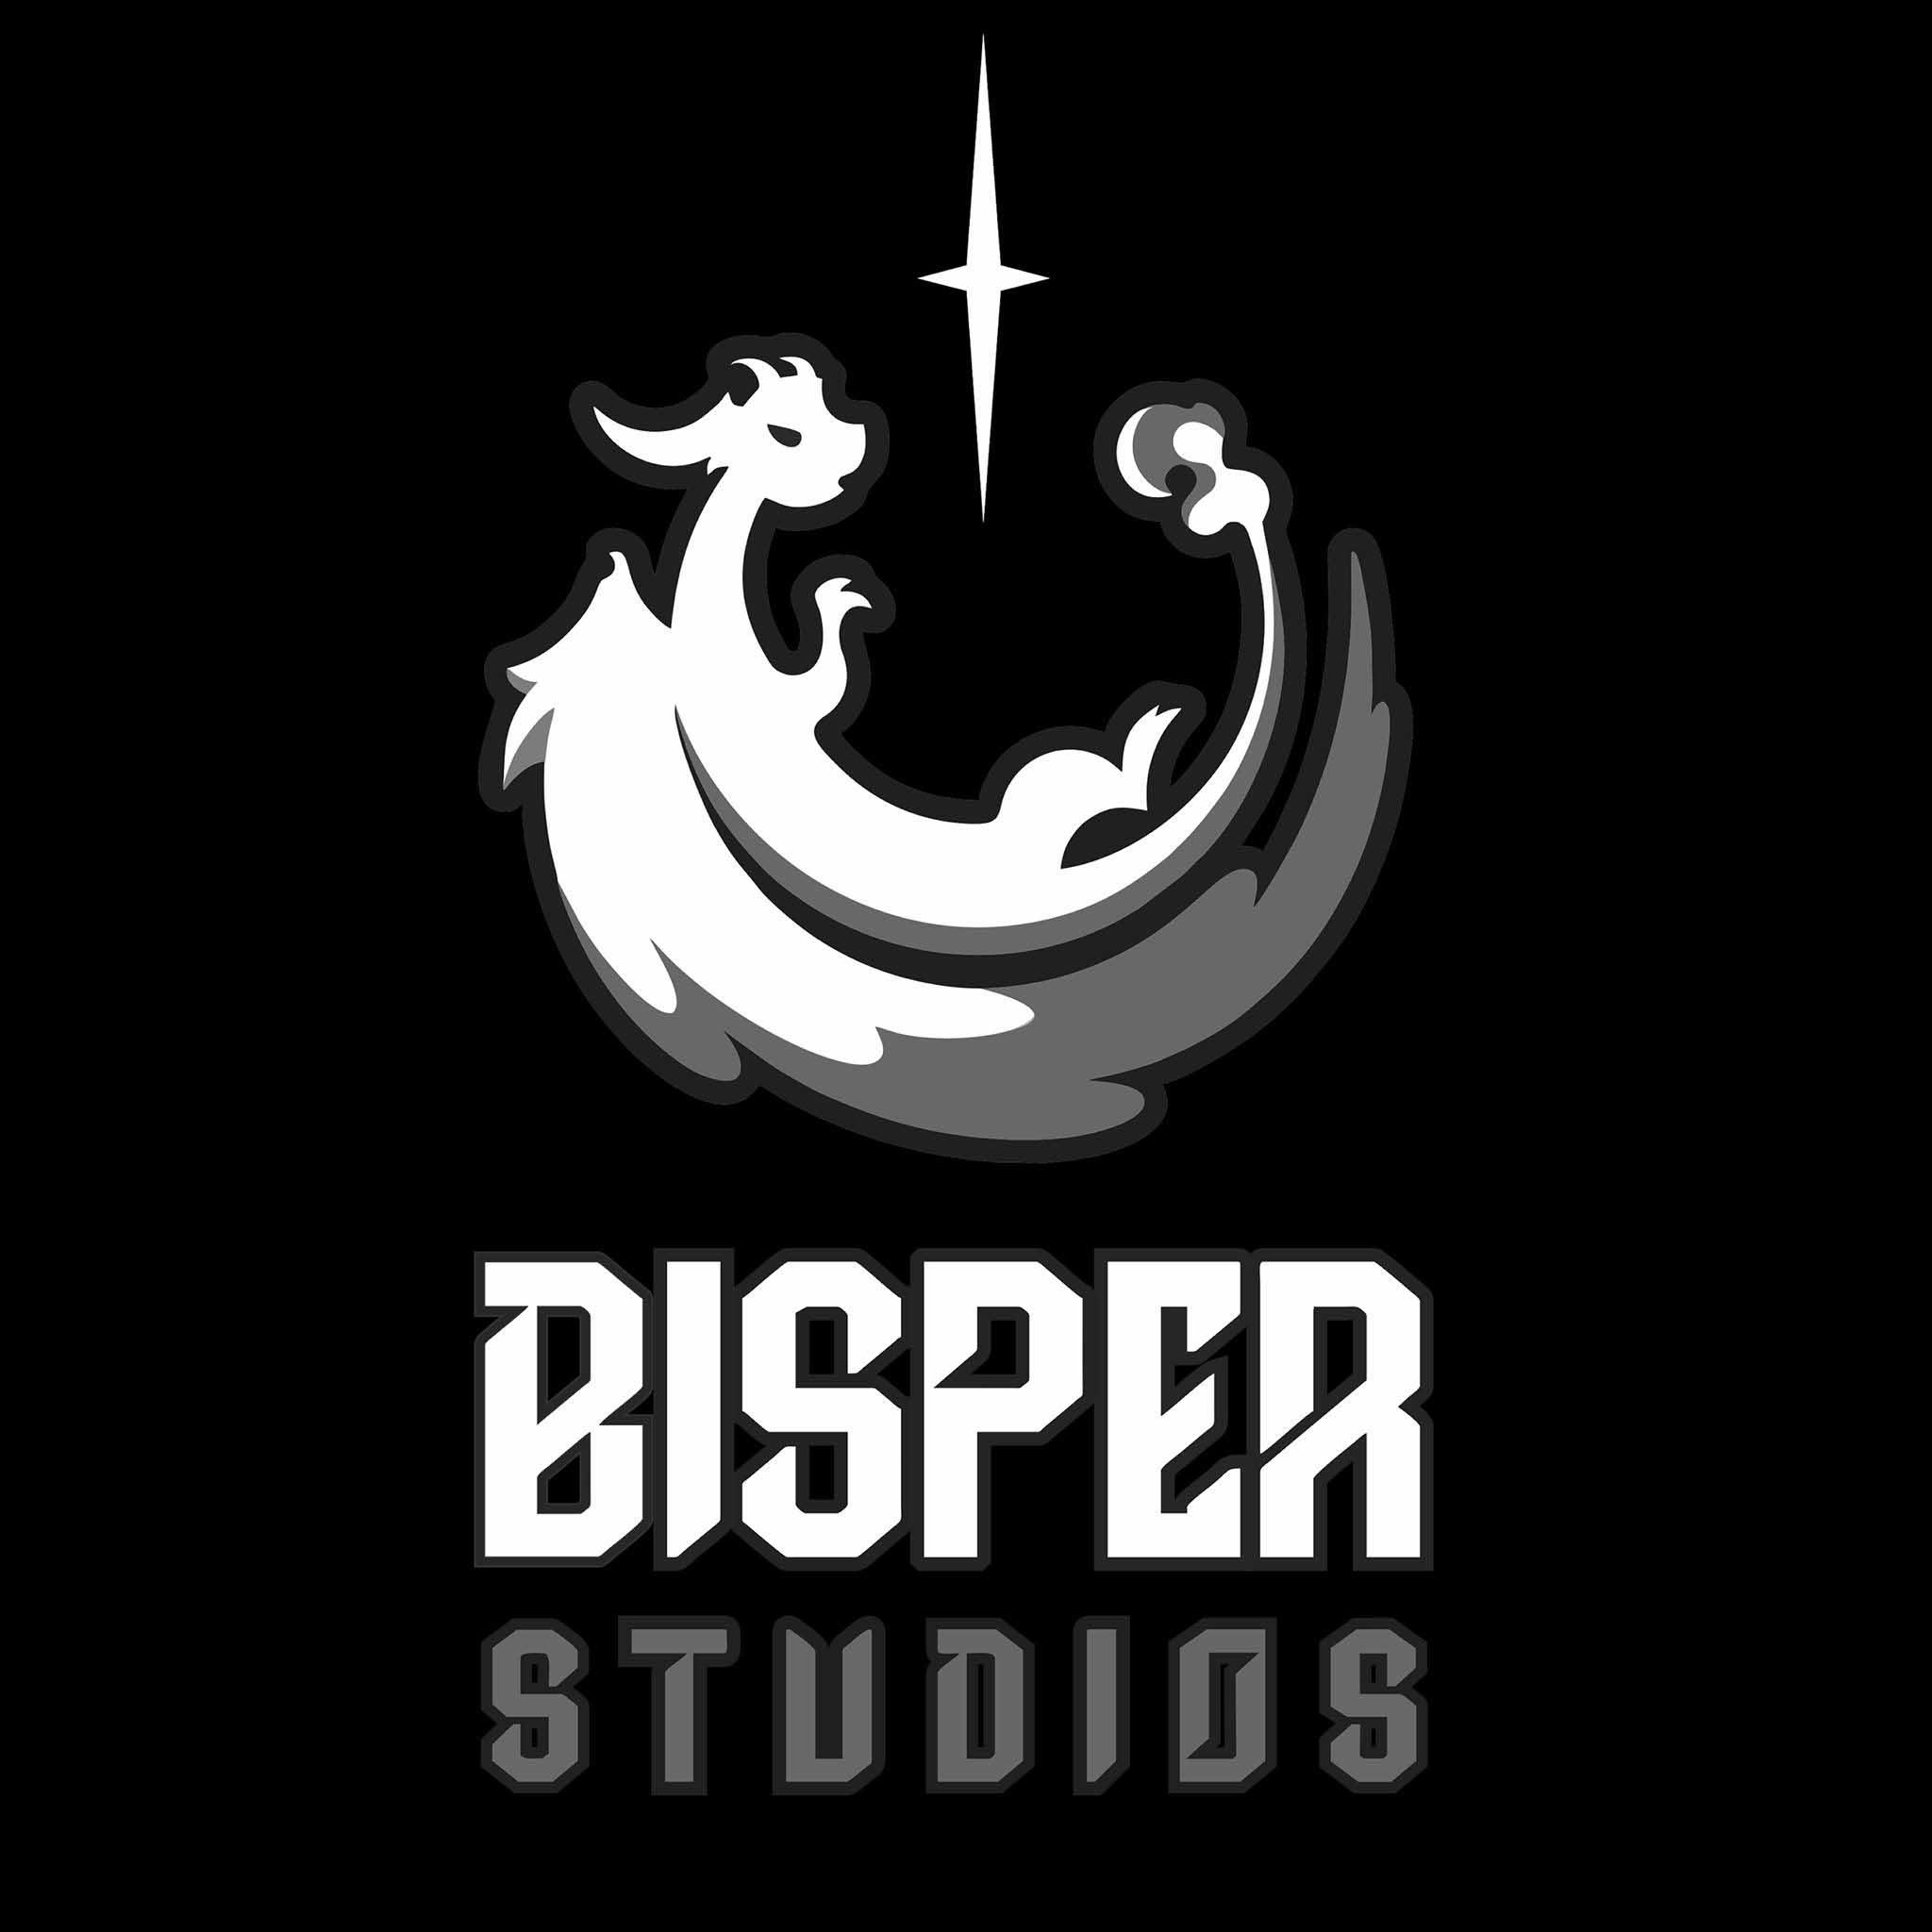 Bisper Studios